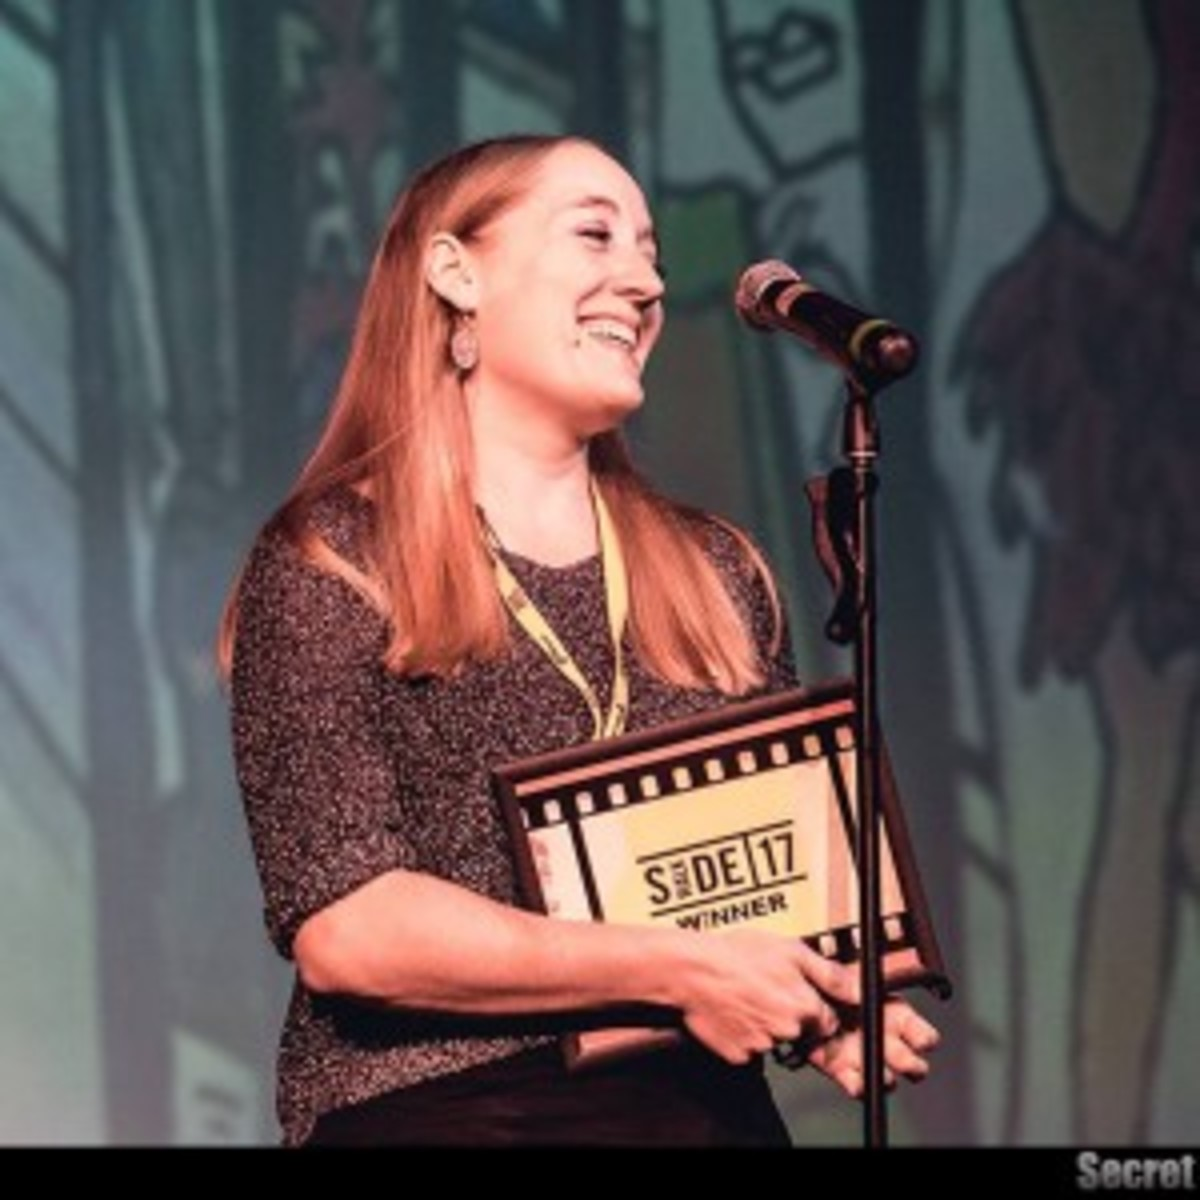 Best Screenplay Award at the Sidewalk Film Festival